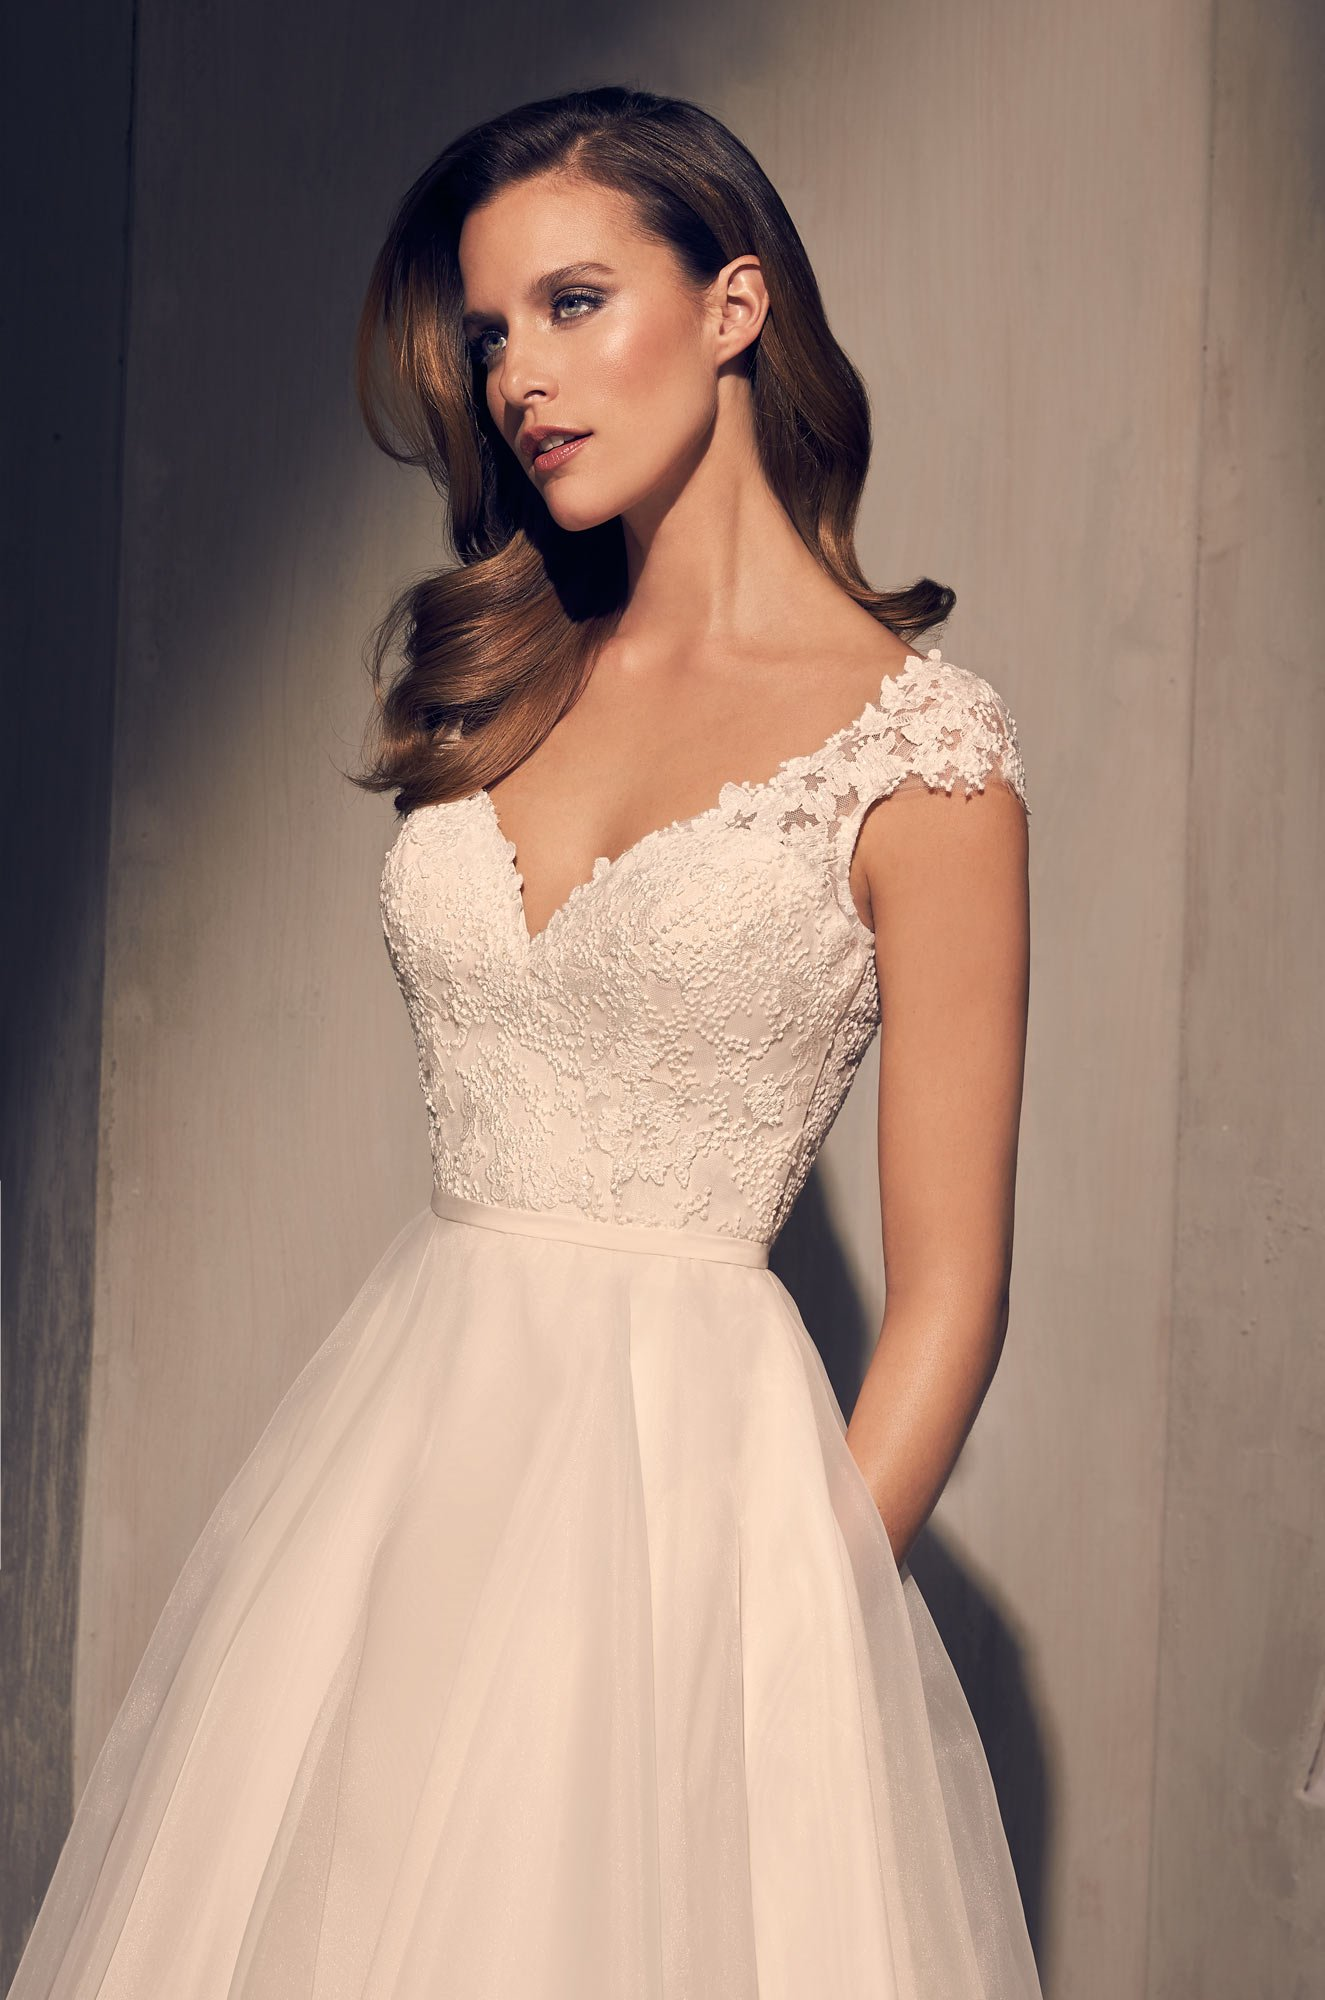 Royal Organza Skirt Wedding Dress - Style #2212 | Mikaella Bridal